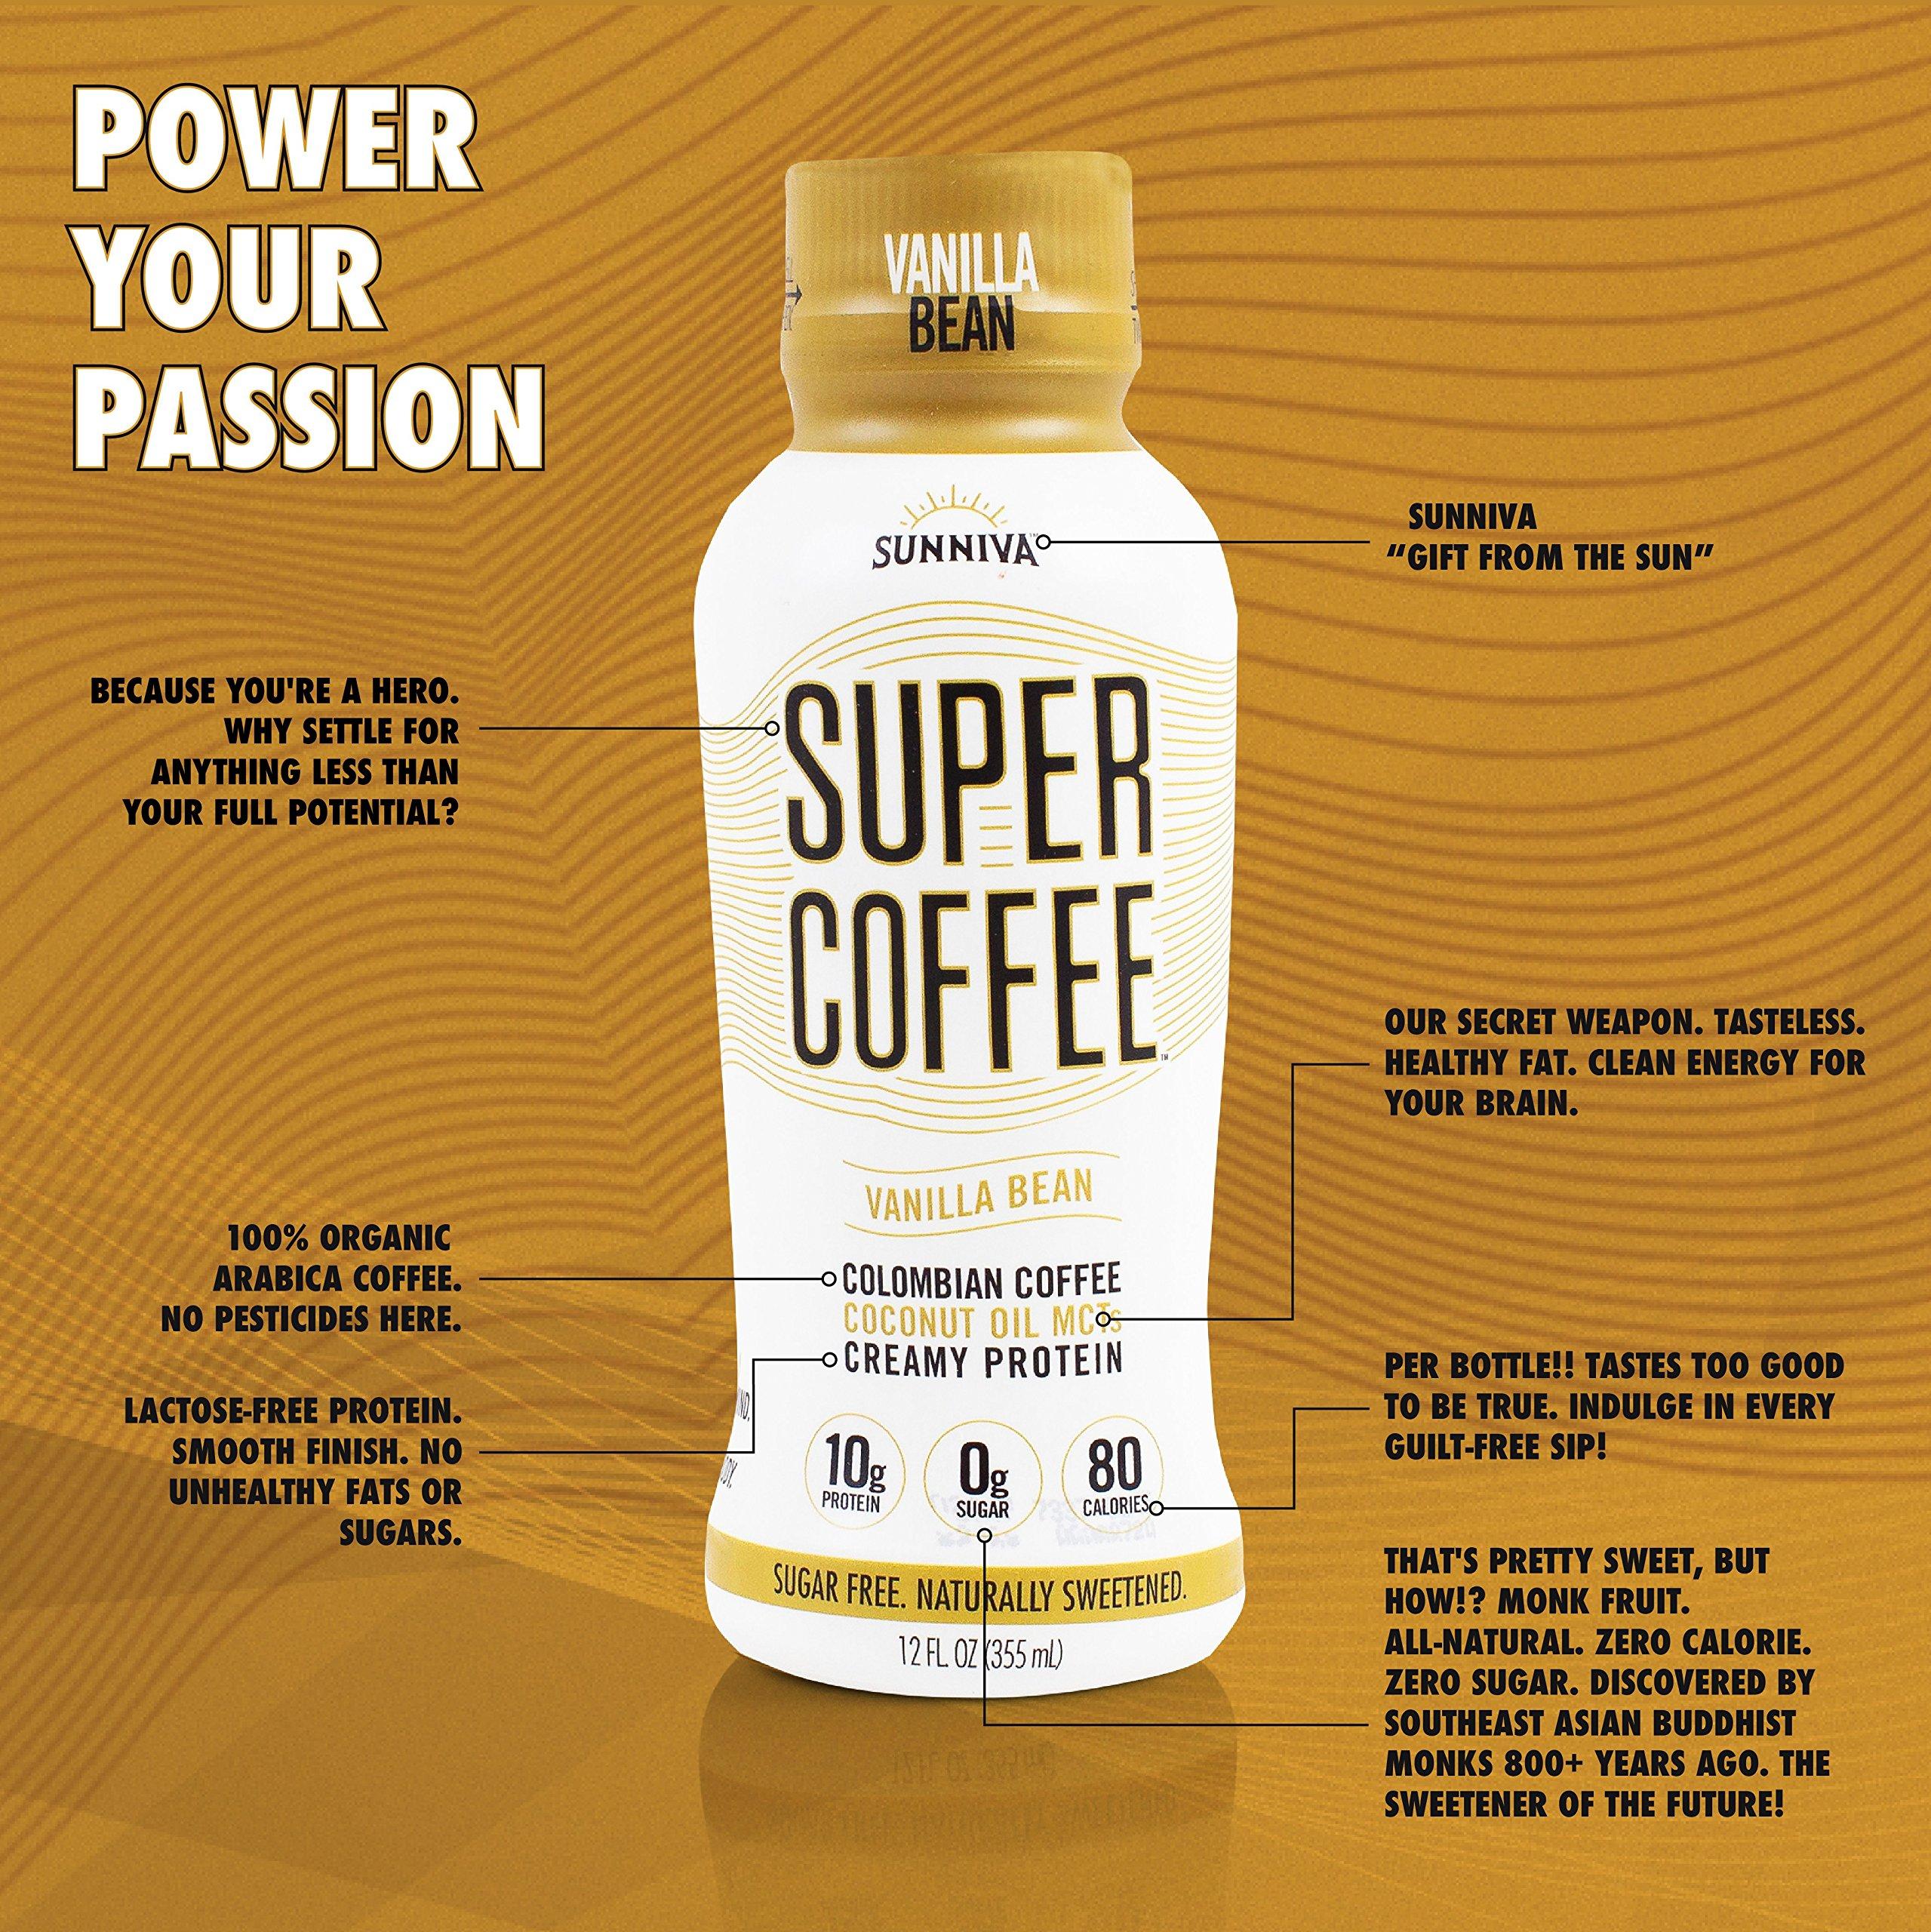 SUNNIVA Super Coffee Creamy Black NEW Sugar-Free Formula, 10g Protein, Lactose Free, Soy Free, Gluten Free, Case of 12